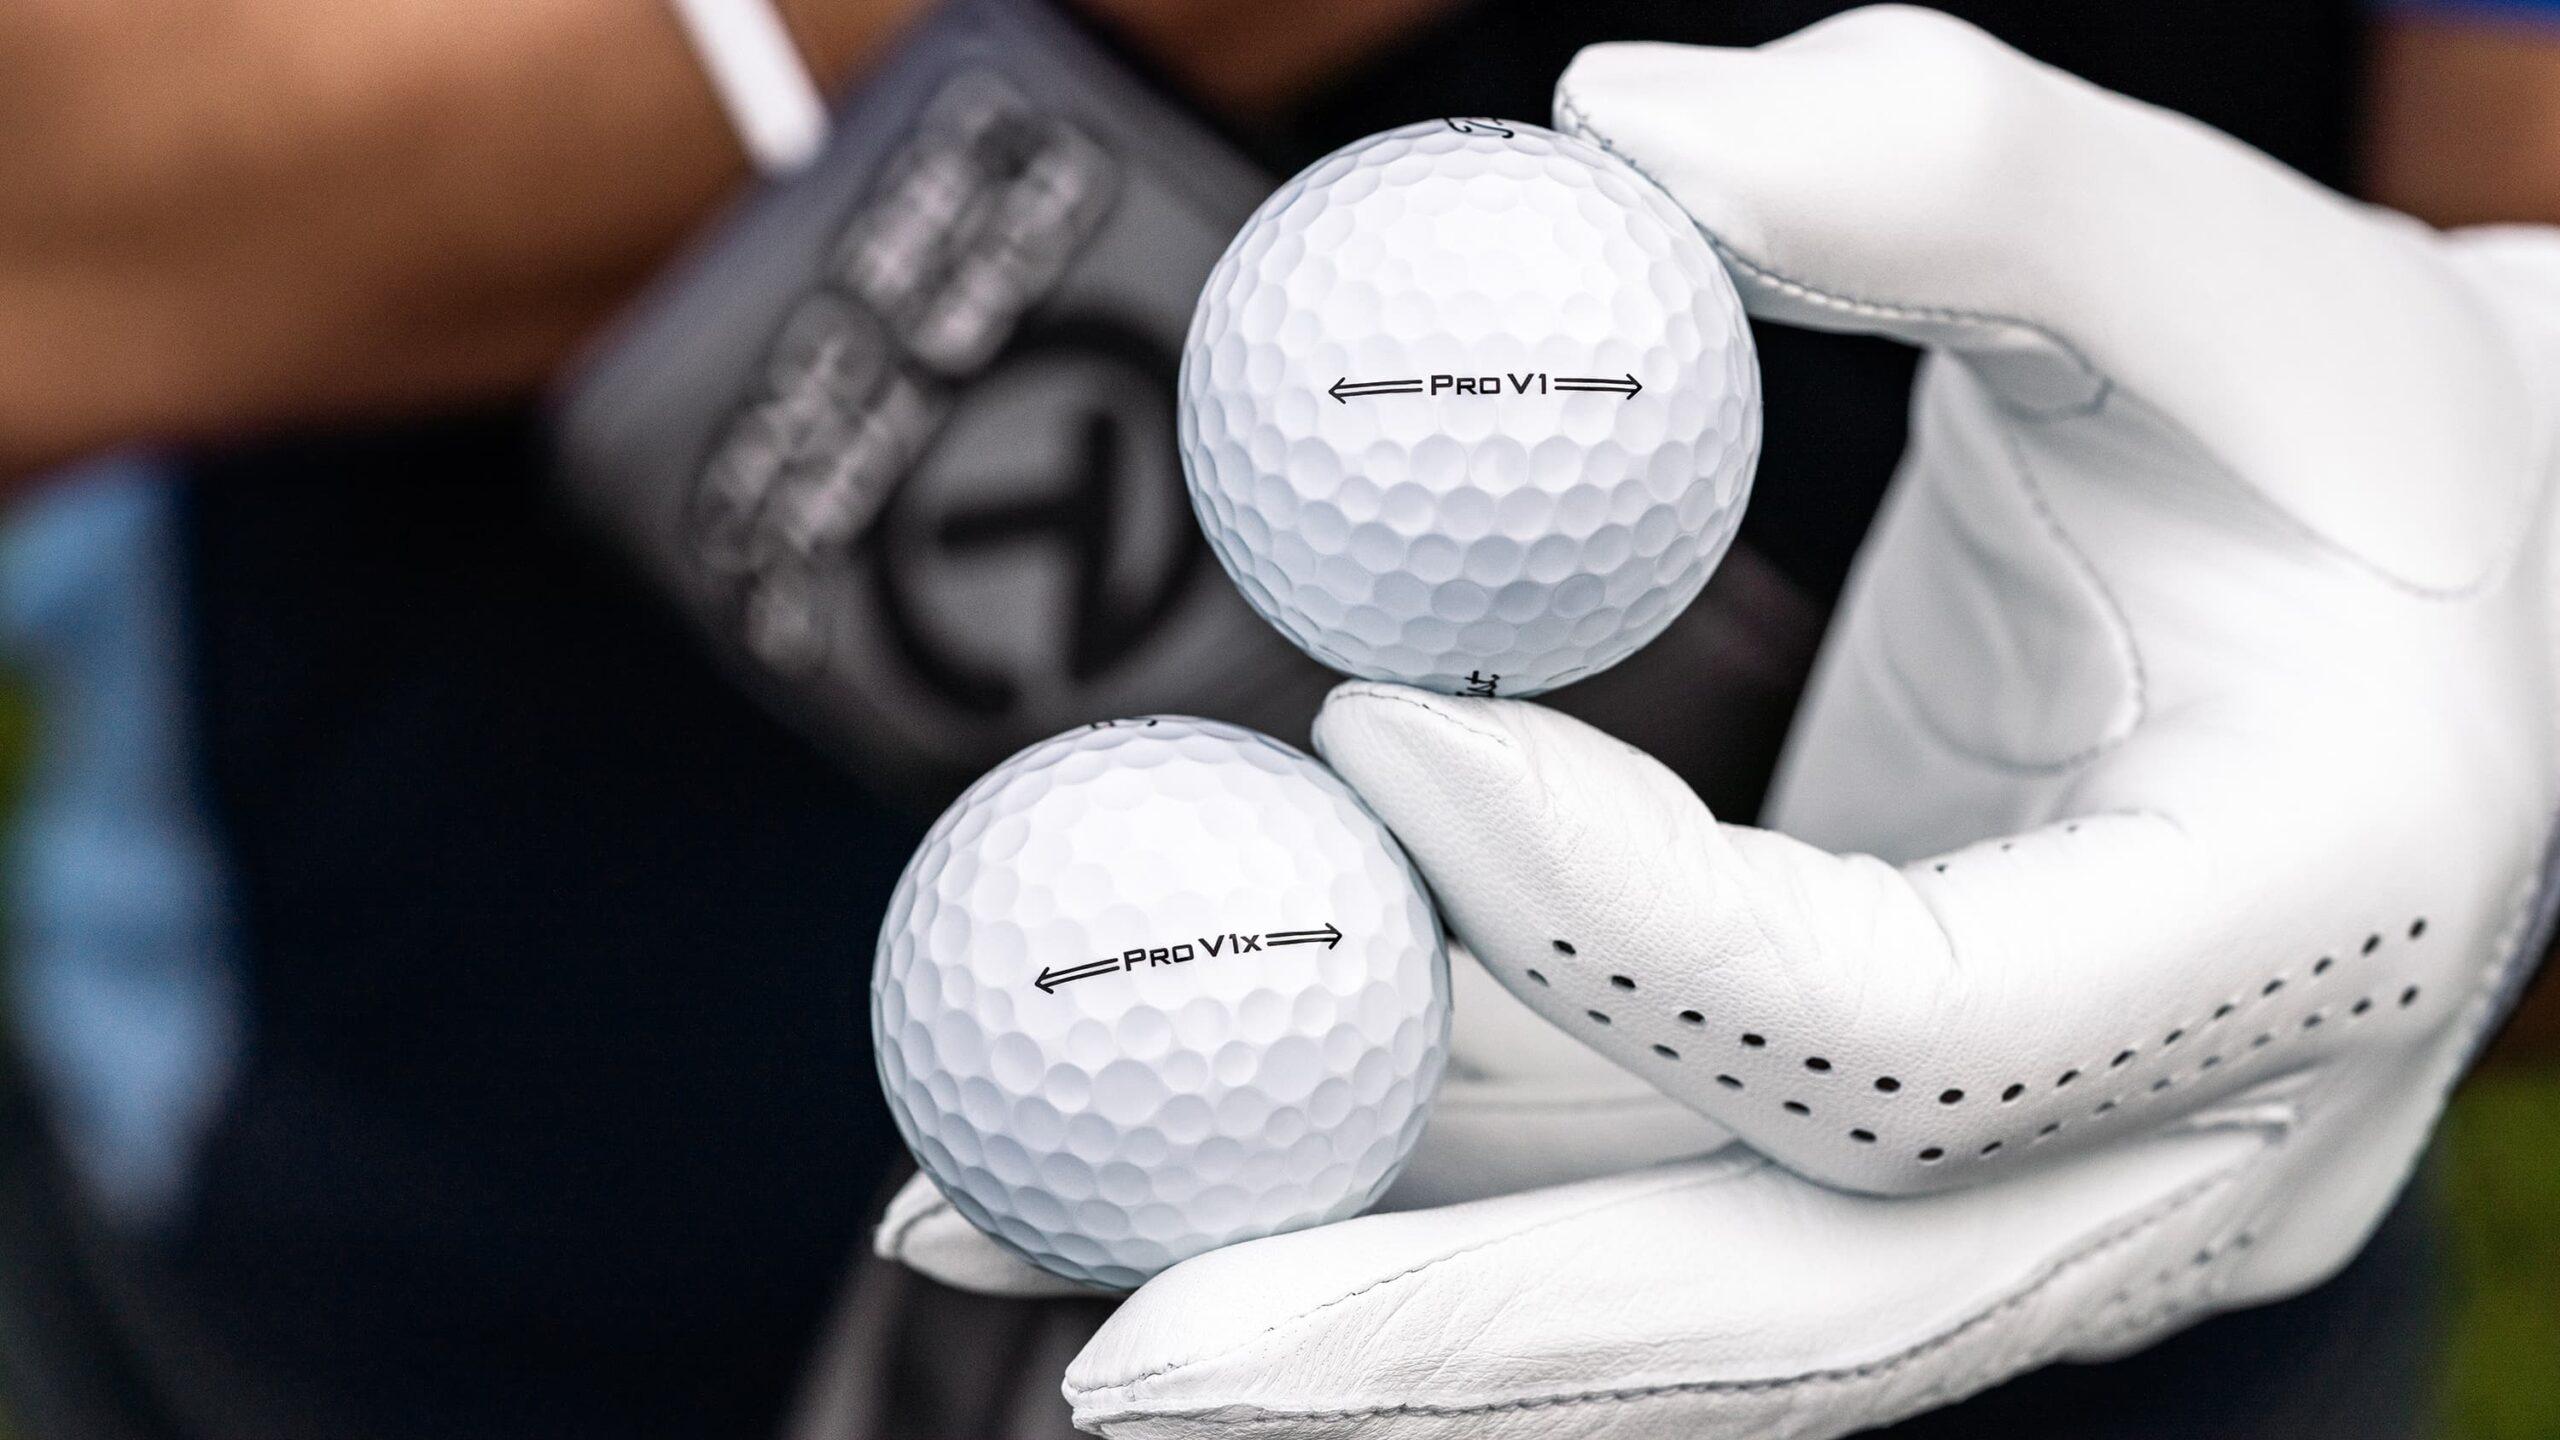 Titleist Pro V1 and Pro V1x Golf Balls